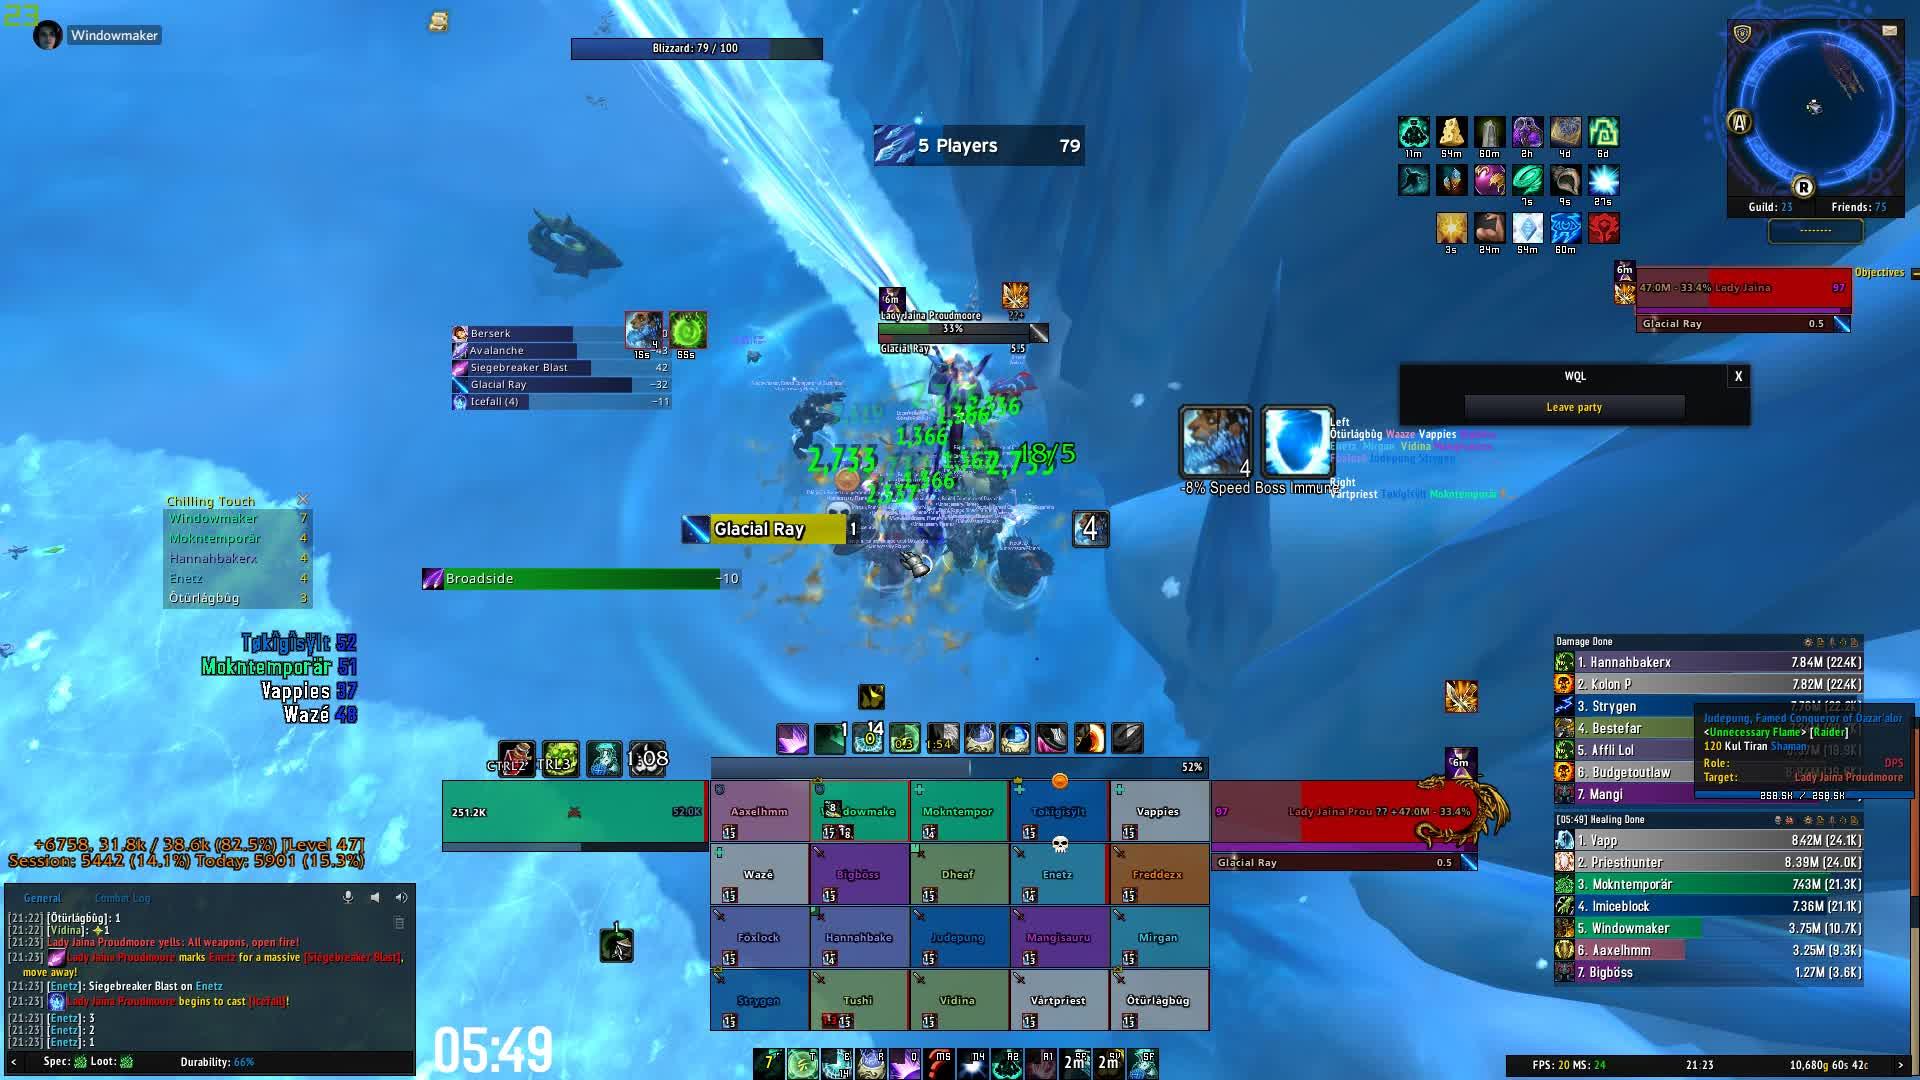 worldofwarcraft, World Of Warcraft 2019.04.11 - 21.24.01.09.DVR GIFs